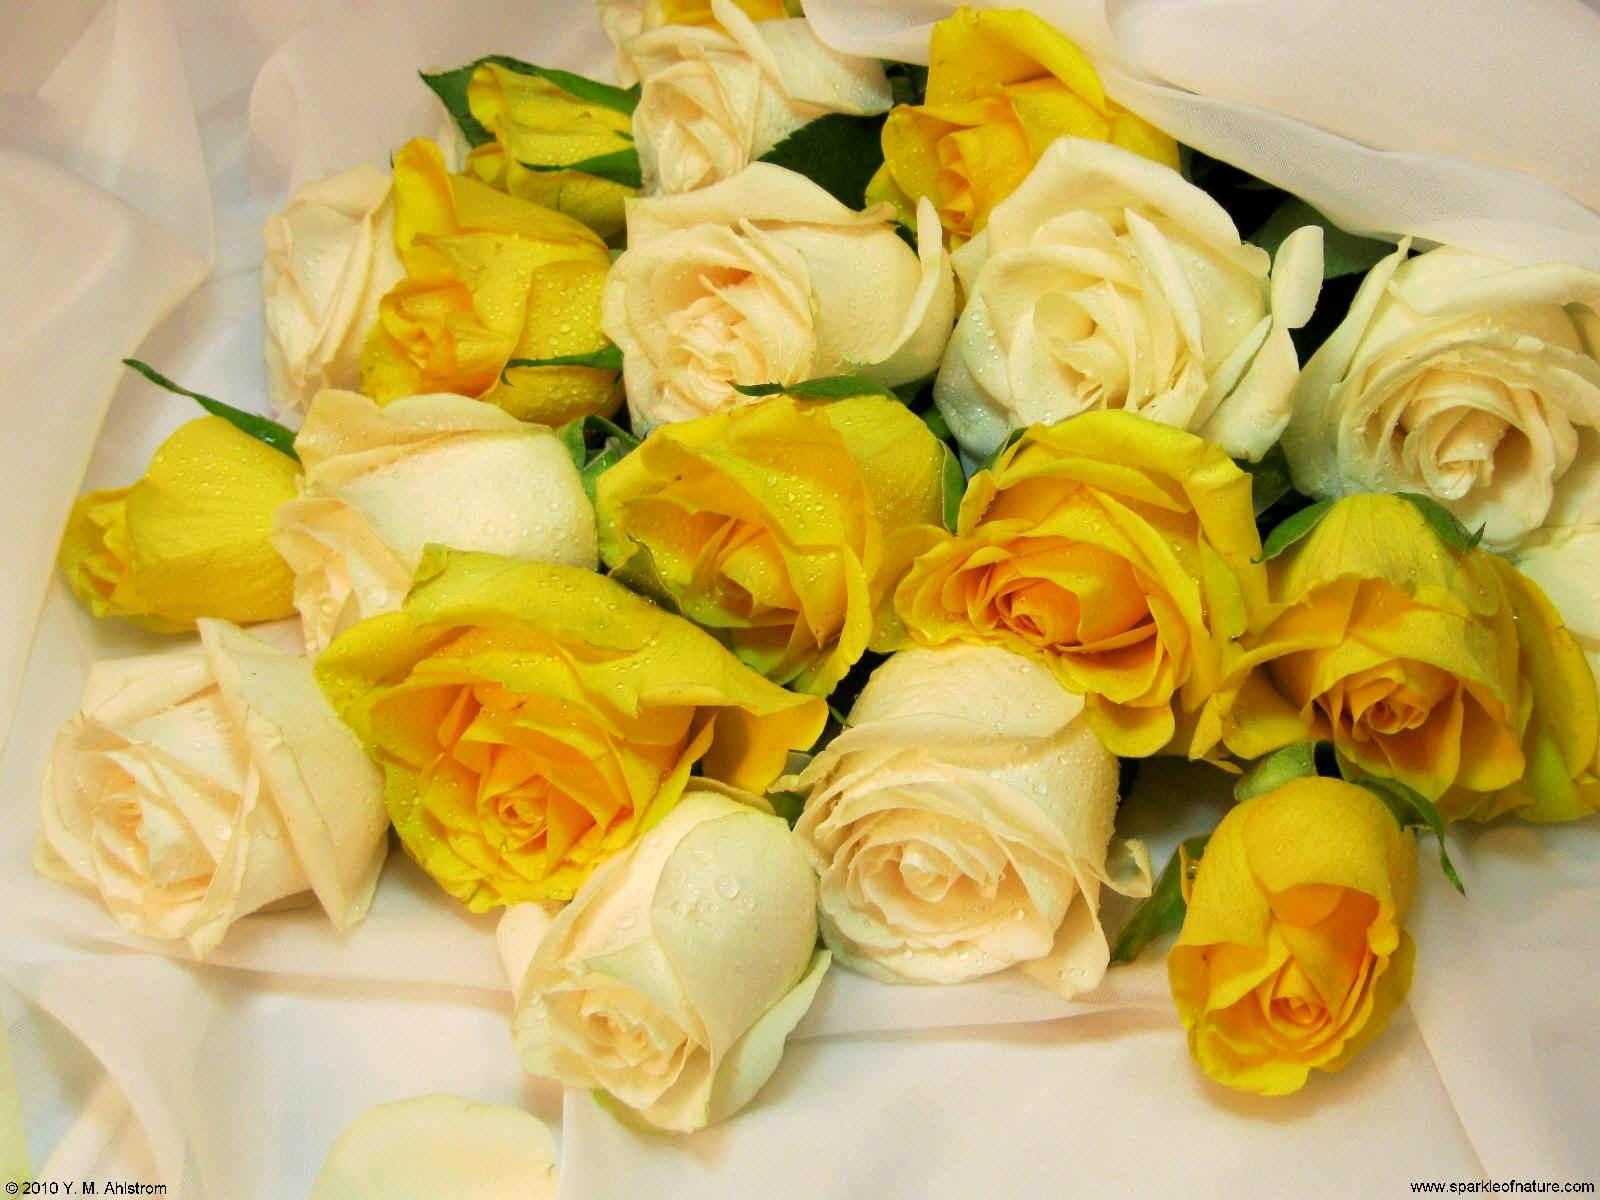 Free desktop wallpapers flowers 21345 1600x1200 for Cream rose wallpaper